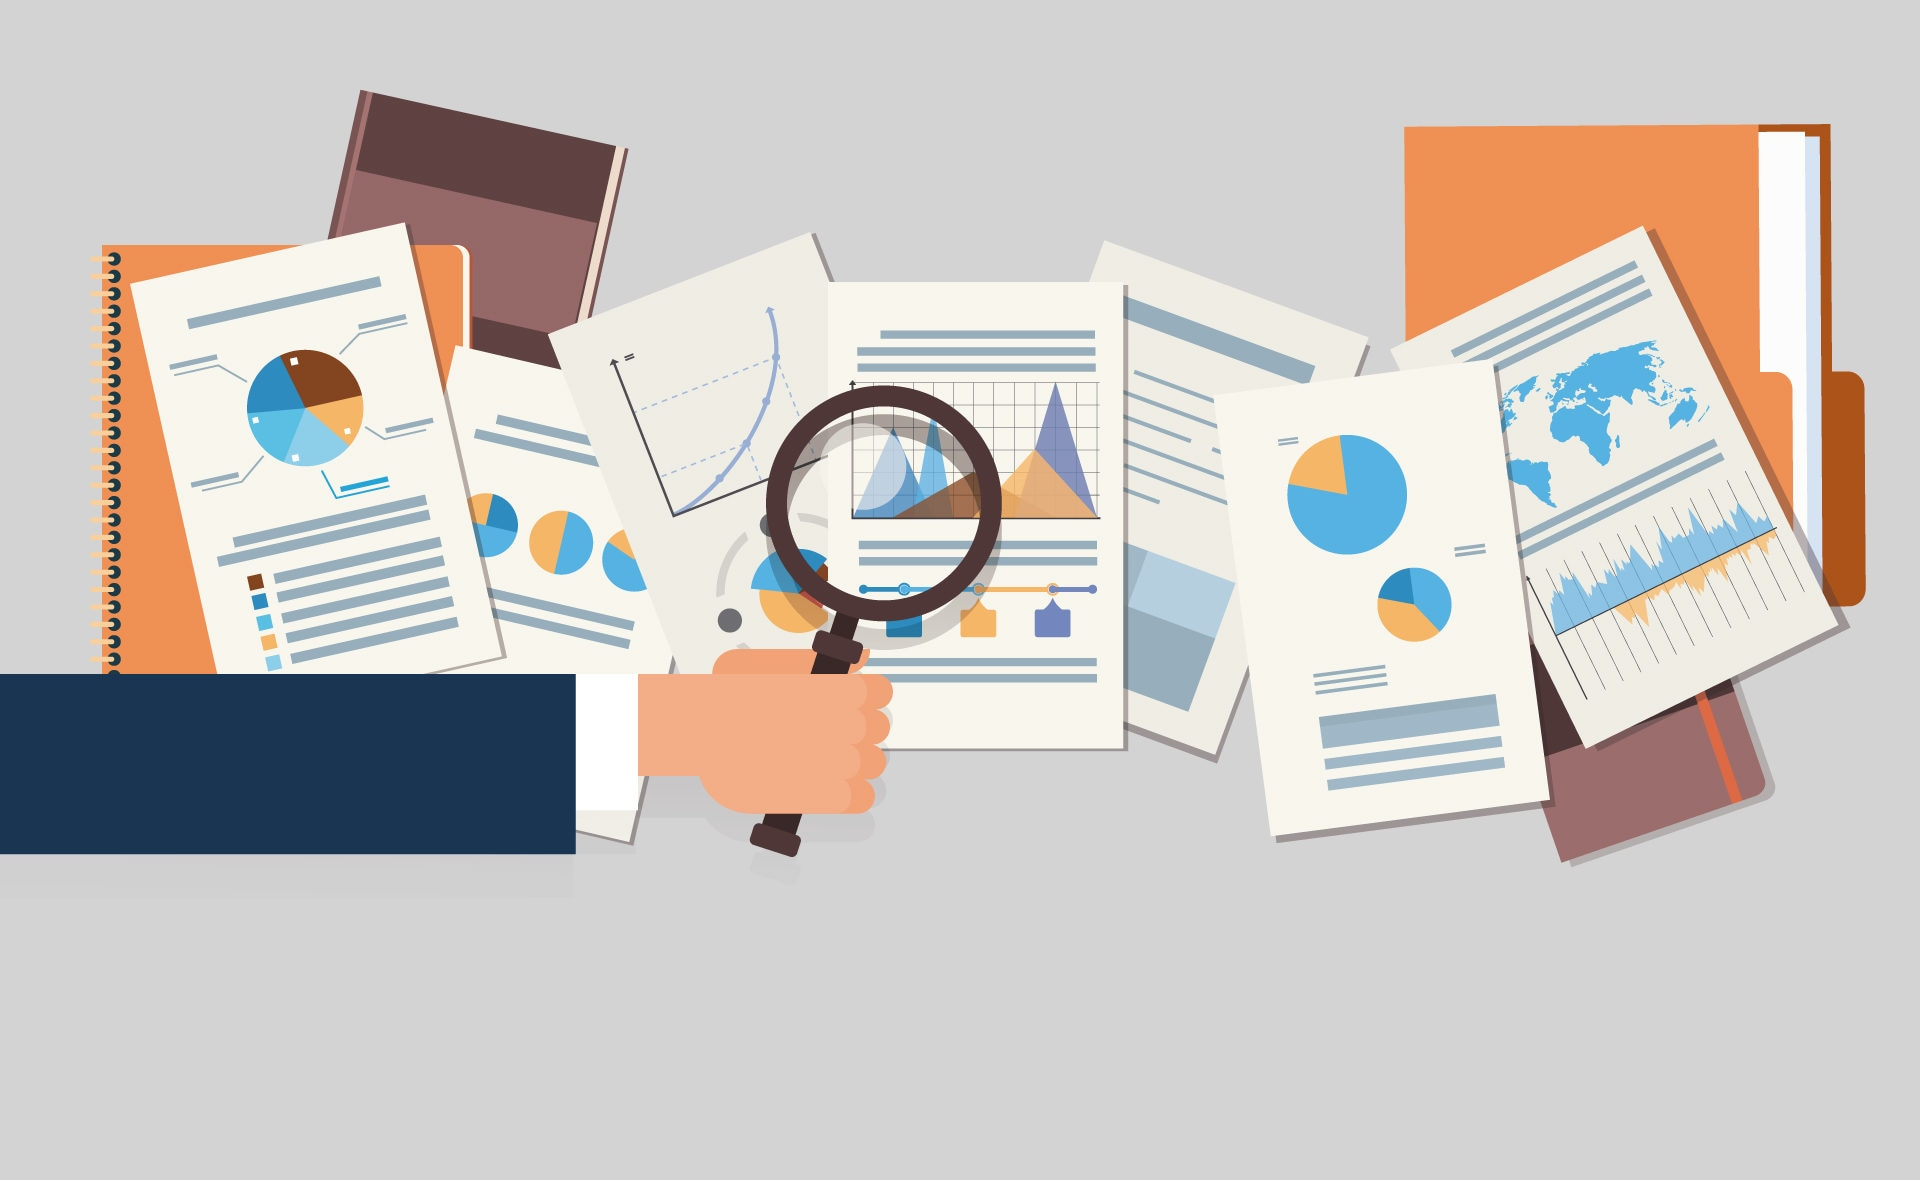 información papeles confidencial privilegiada buscar investigar recurso bbva